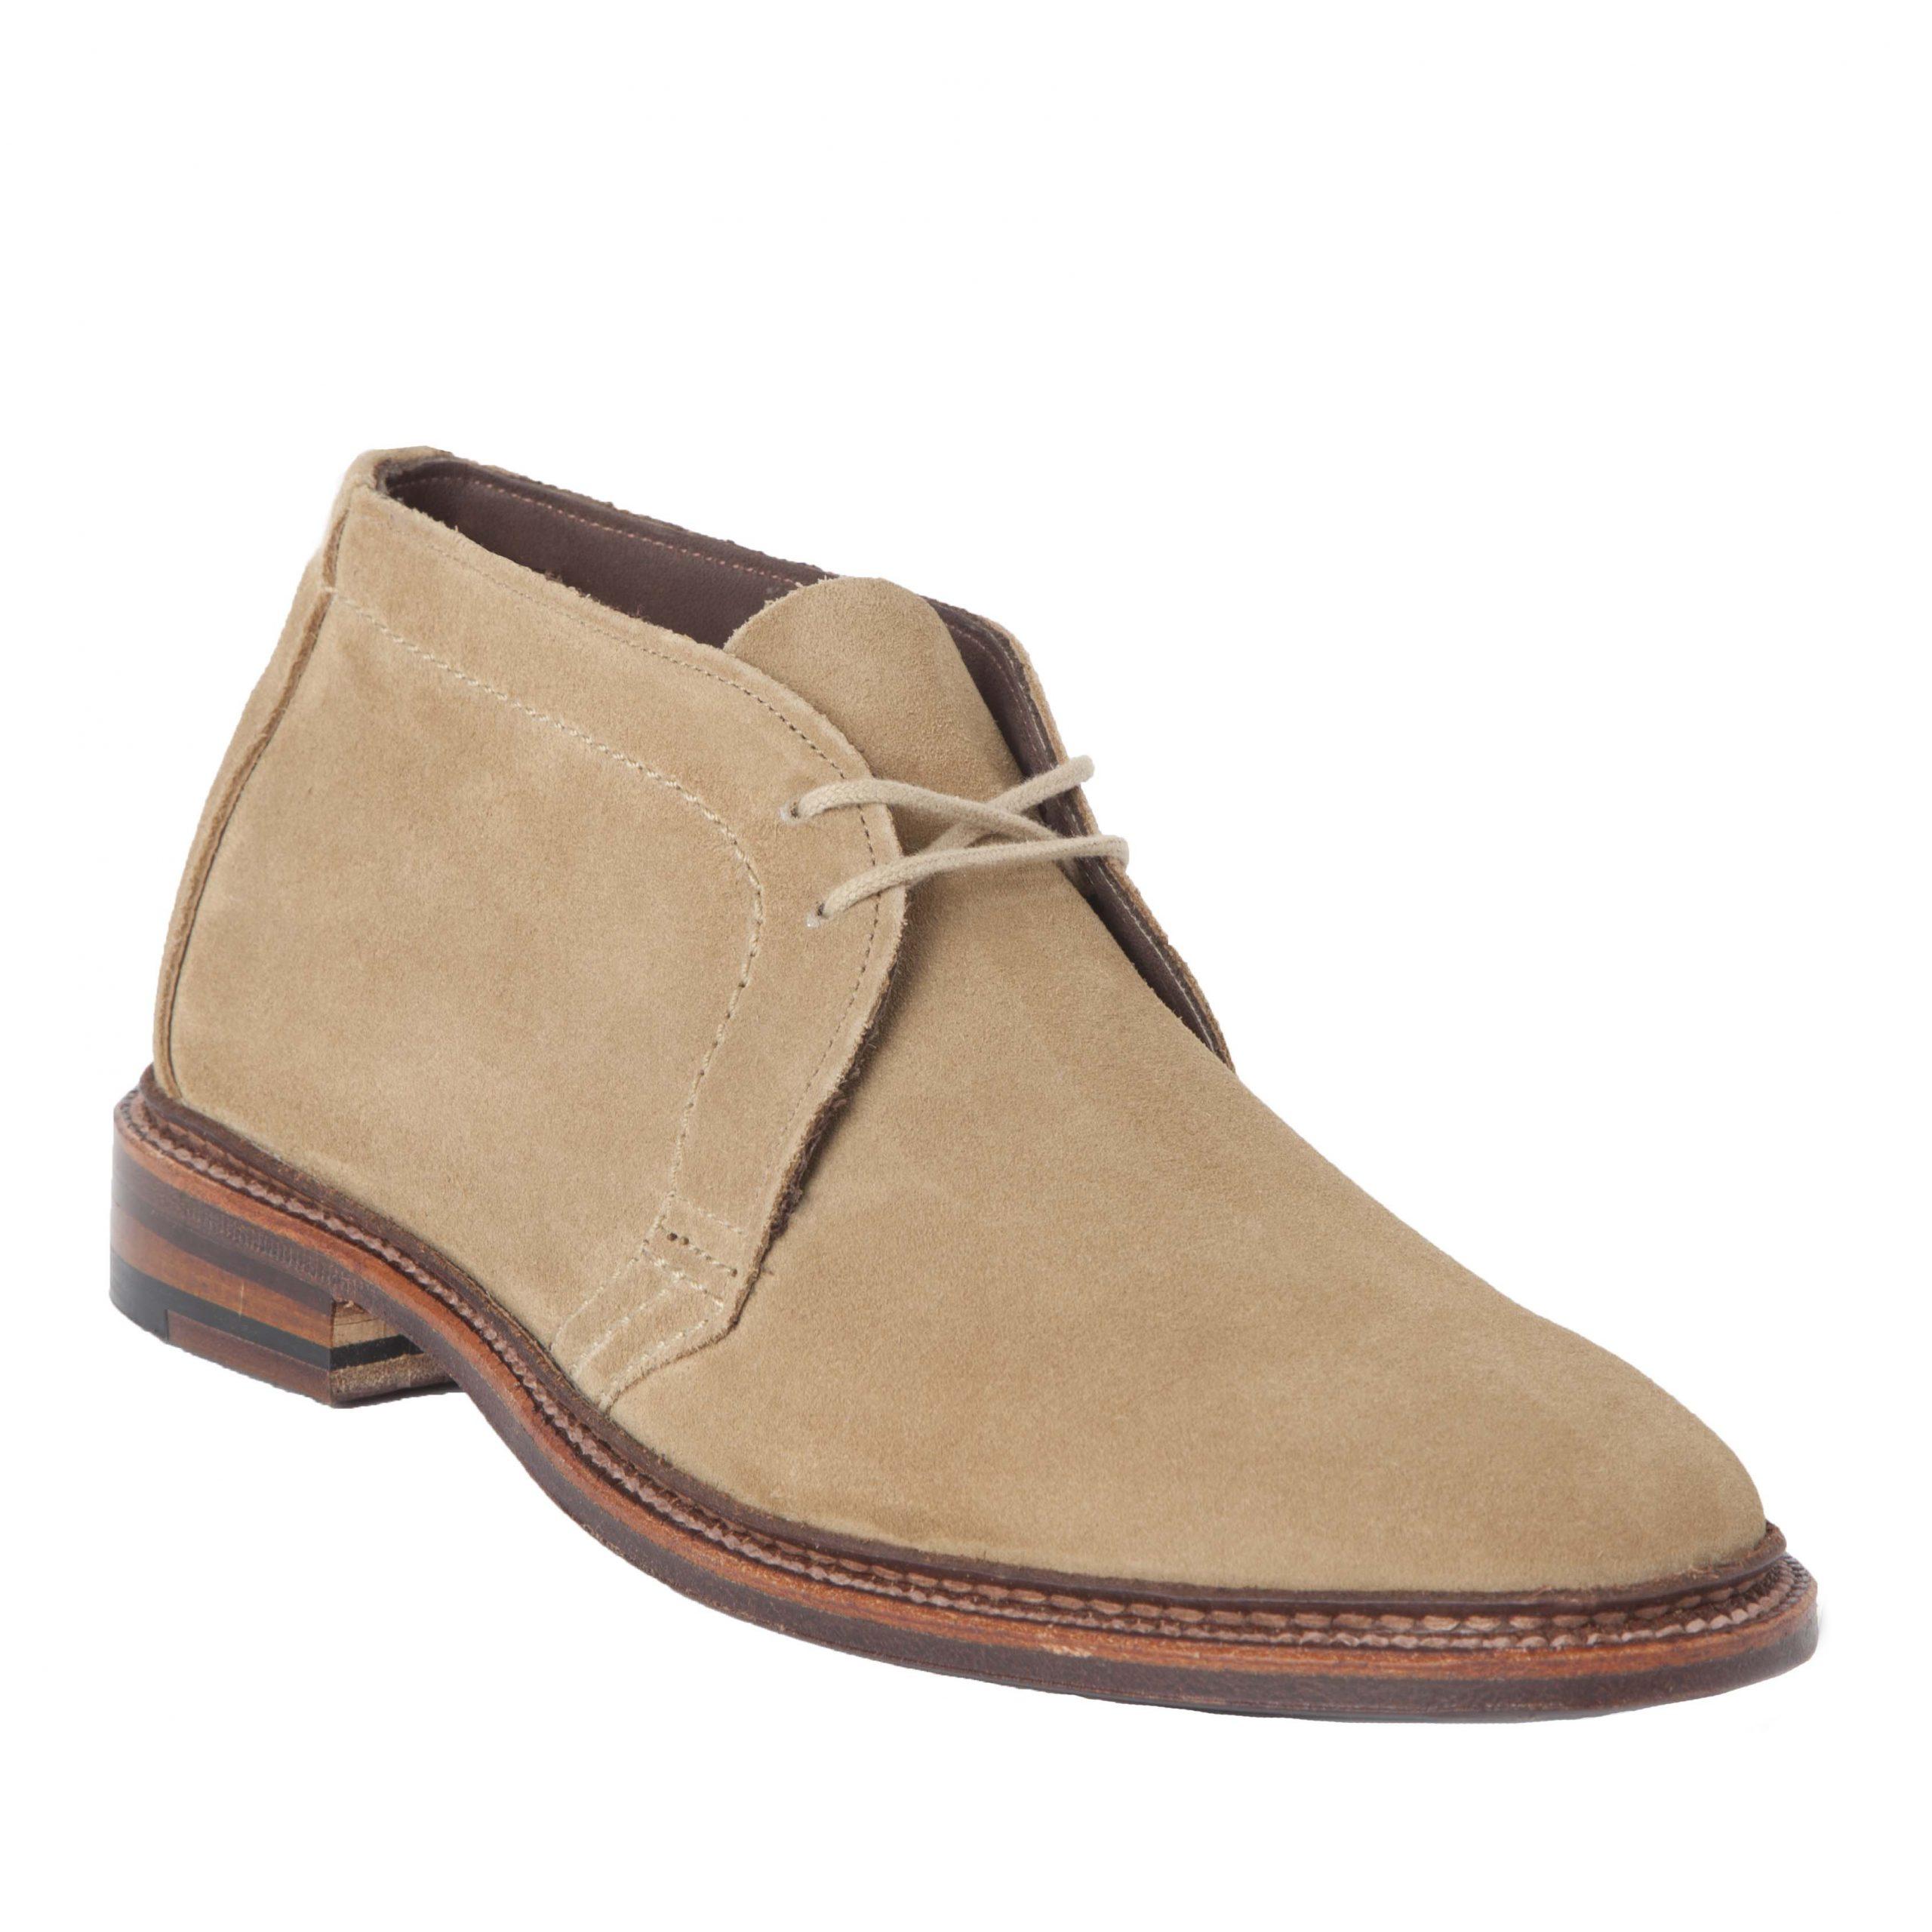 Alden Shoes Madison Avenue New York